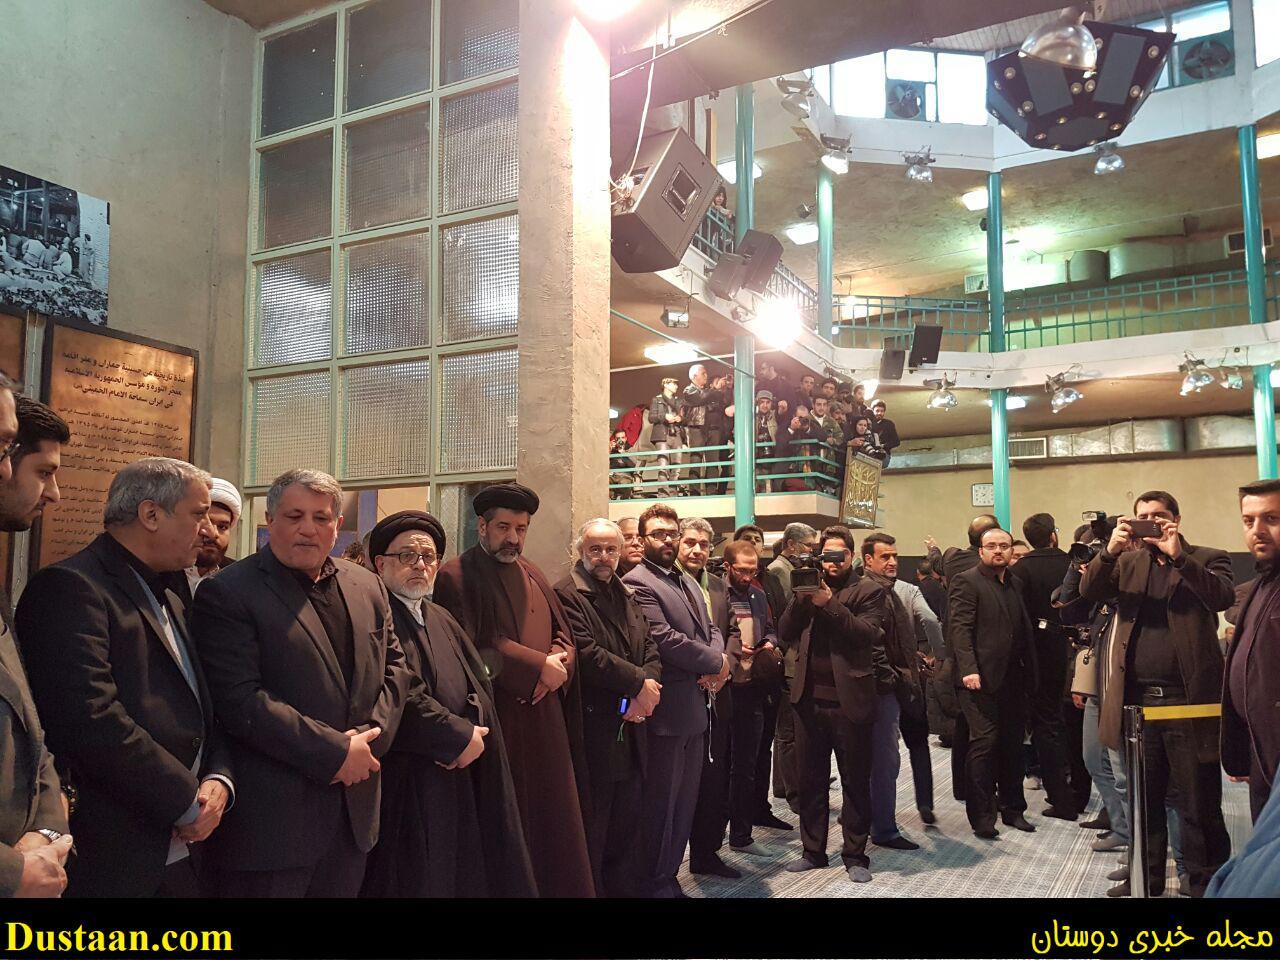 www.dustaan.com عکس: مراسم سوگواری آیت الله هاشمی با حضور رئیس جمهور